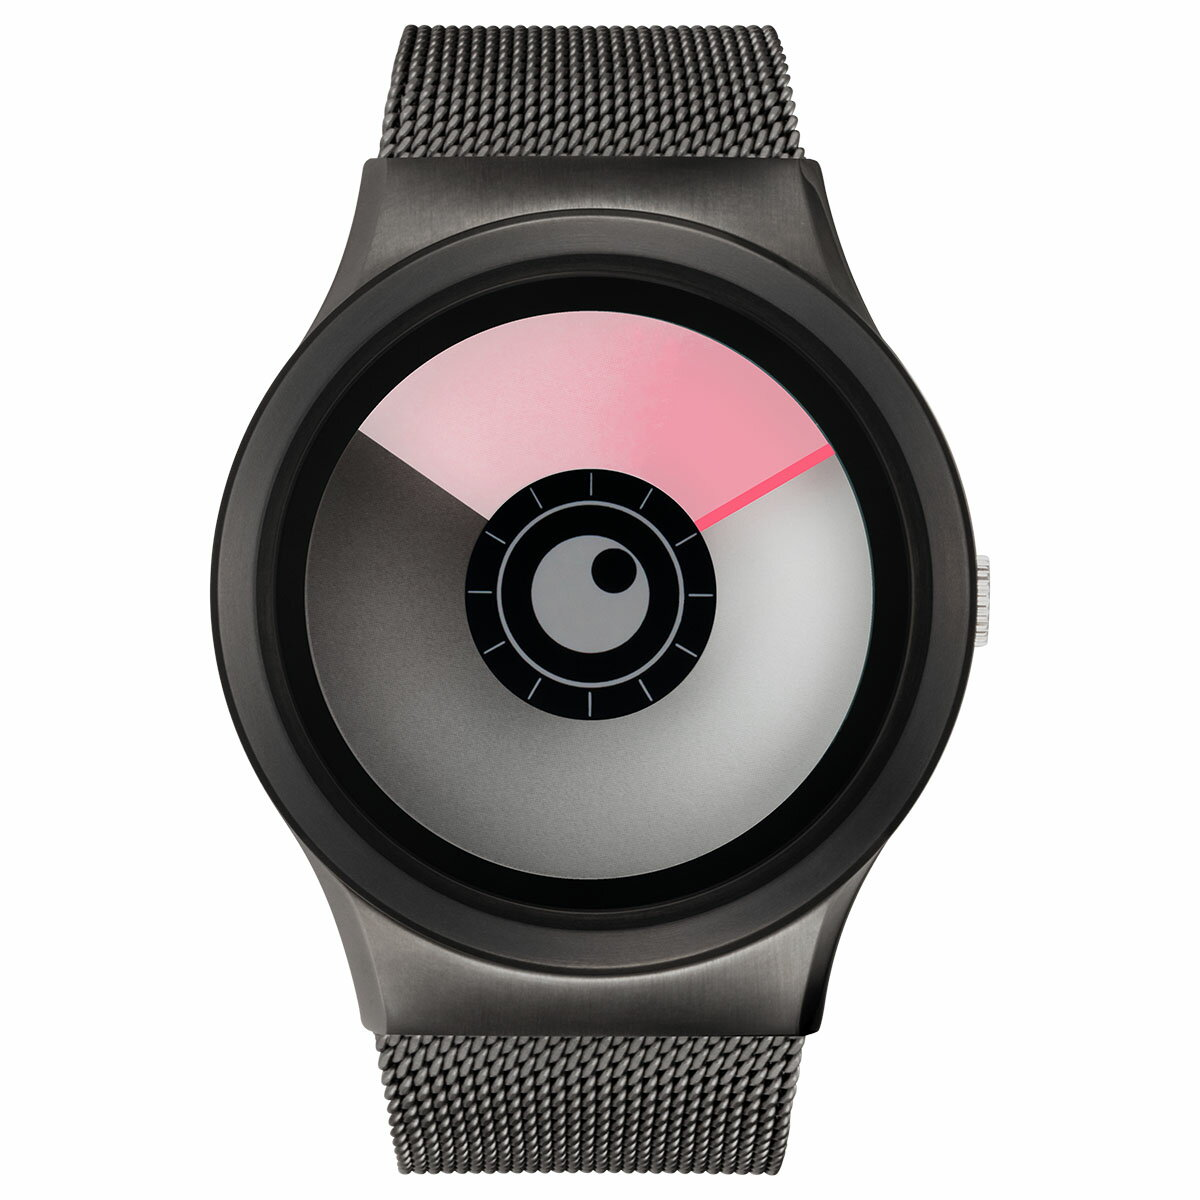 ZEROO AURORA BOREALIS ゼロ 電池式クォーツ 腕時計 [W12020B02SM02] ピンク デザインウォッチ ペア用 メンズ レディース ユニセックス おしゃれ時計 デザイナーズ